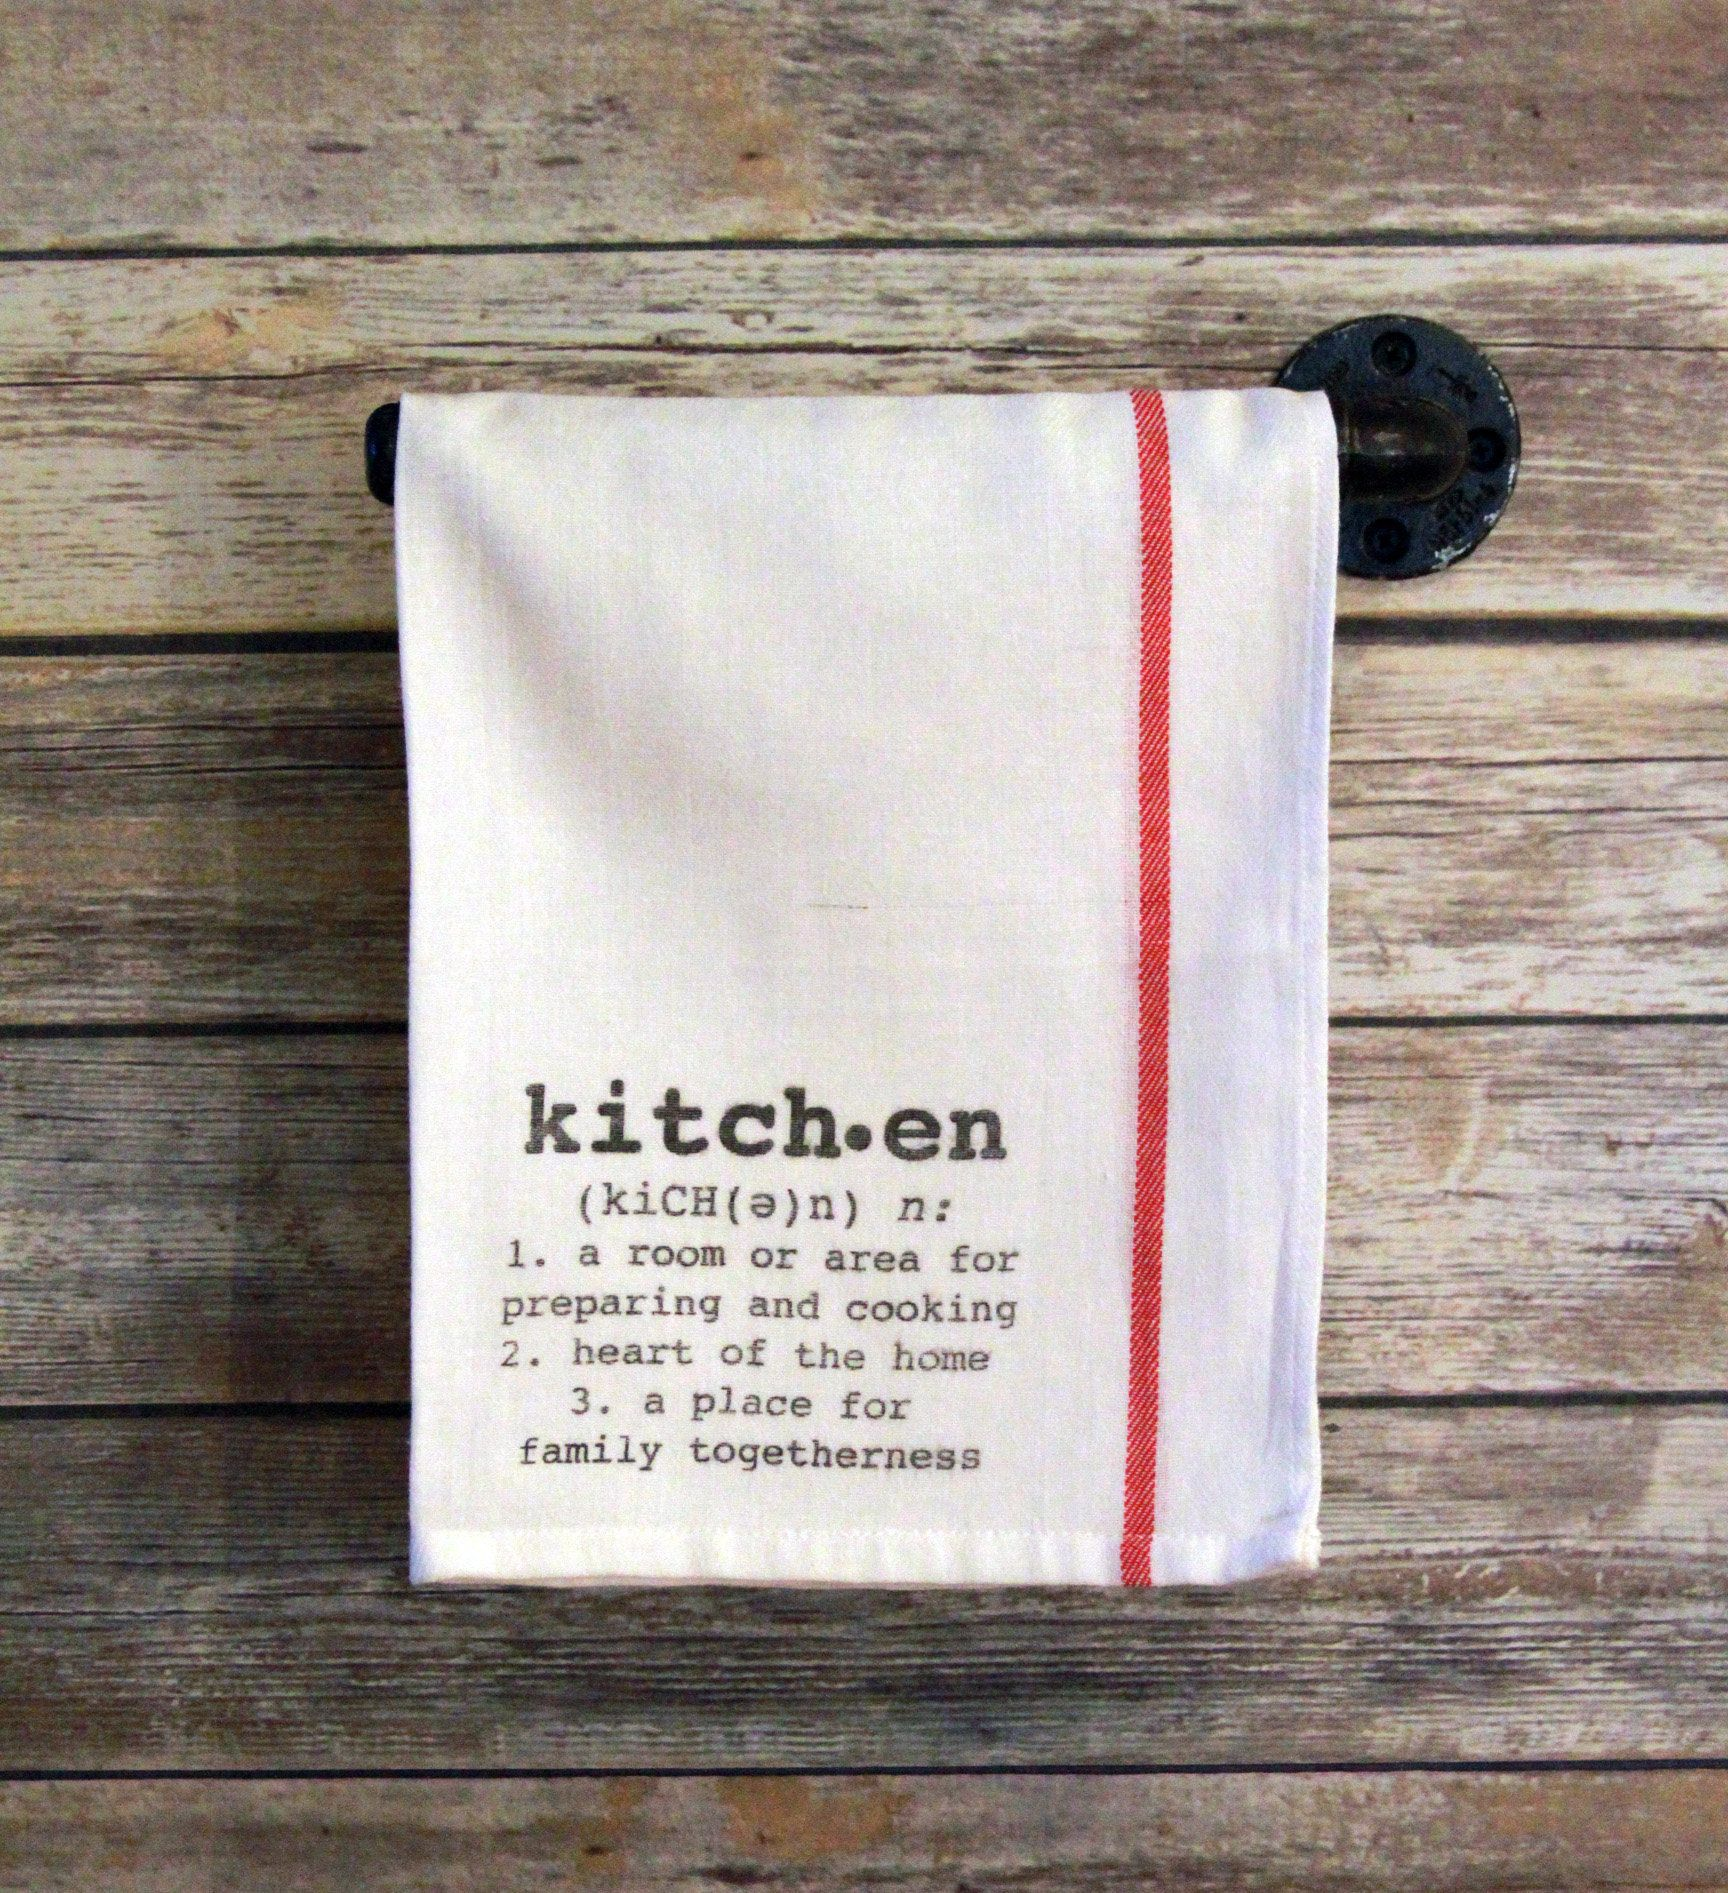 Kitchen Dish Towel Funny Hand Towel Hanging Dish Towel Funny Tea Towel Kitchen Gift Home Gift Girlfriend Gift Funny Tea Towels Dish Towels Kitchen Humor